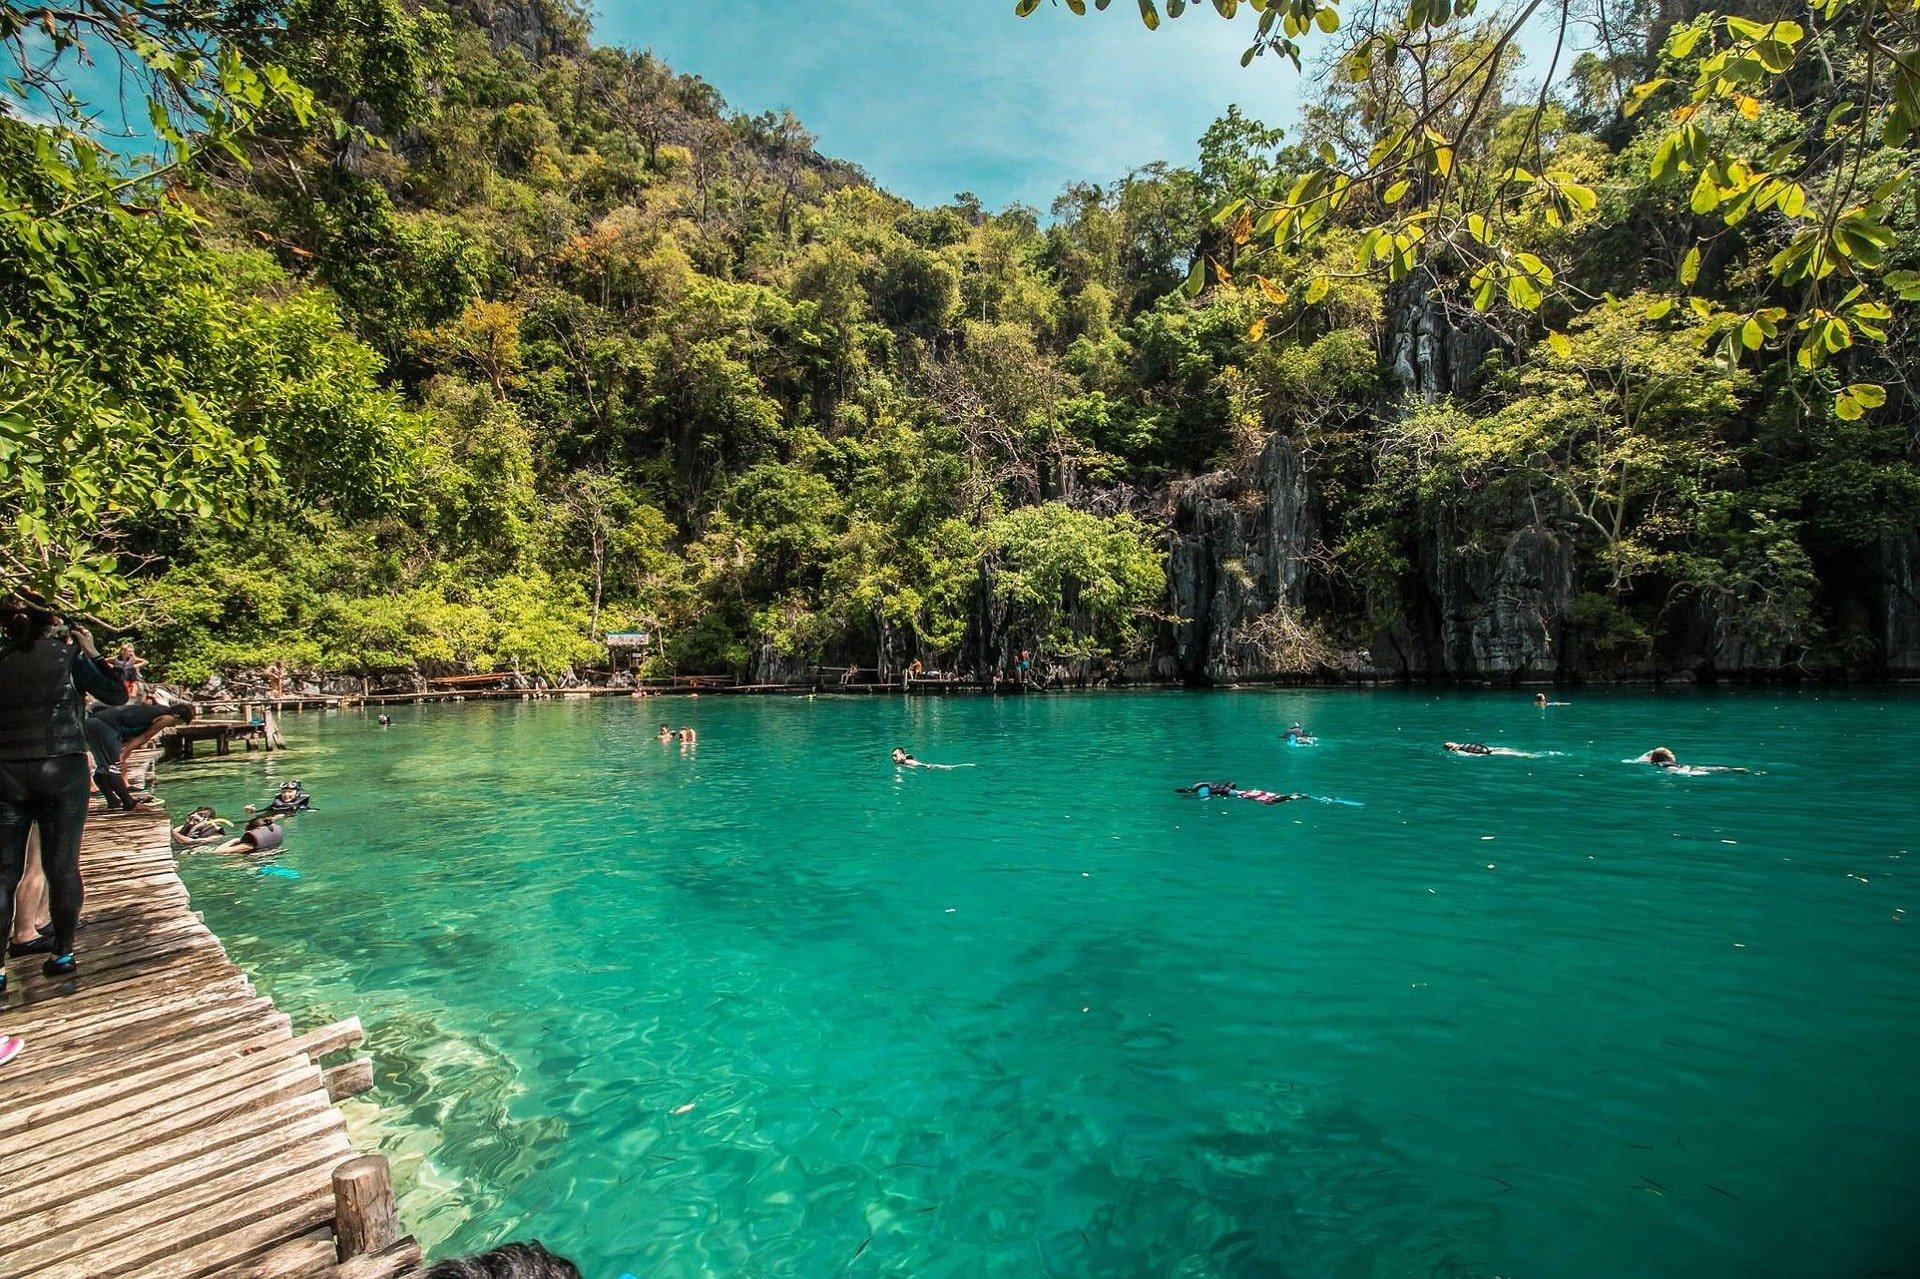 lagon baignade aux philippines voyage famille